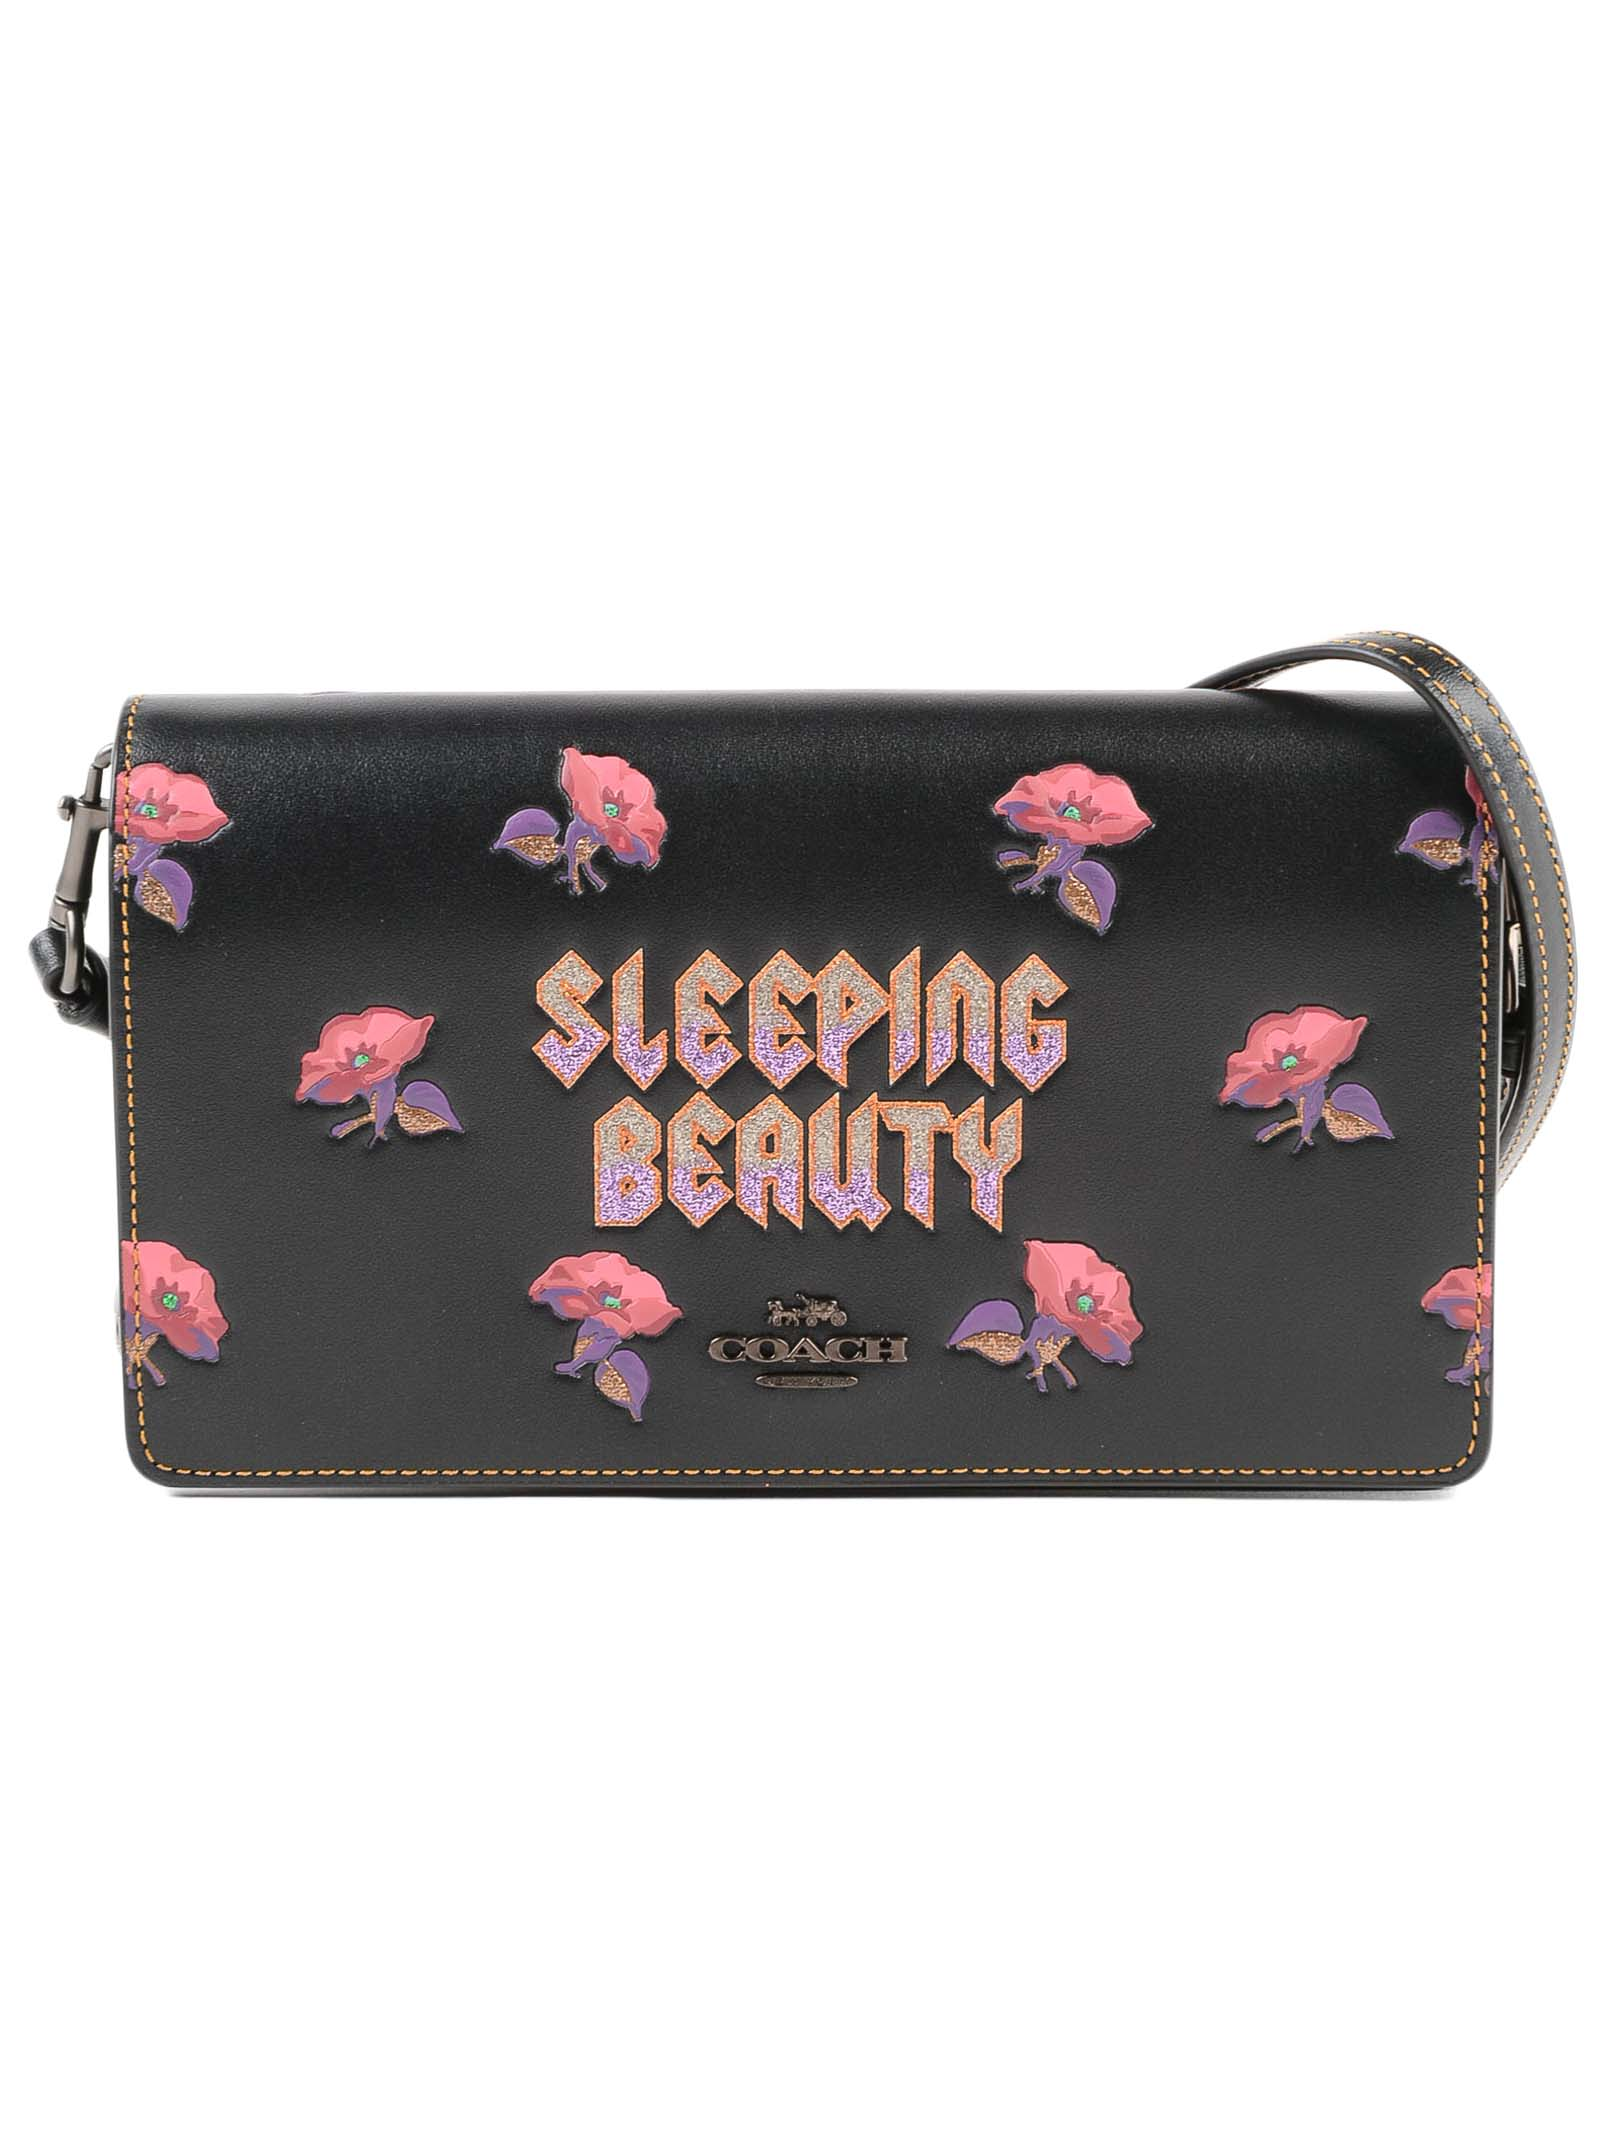 Sleeping Beauty Foldover Xbody Clutch